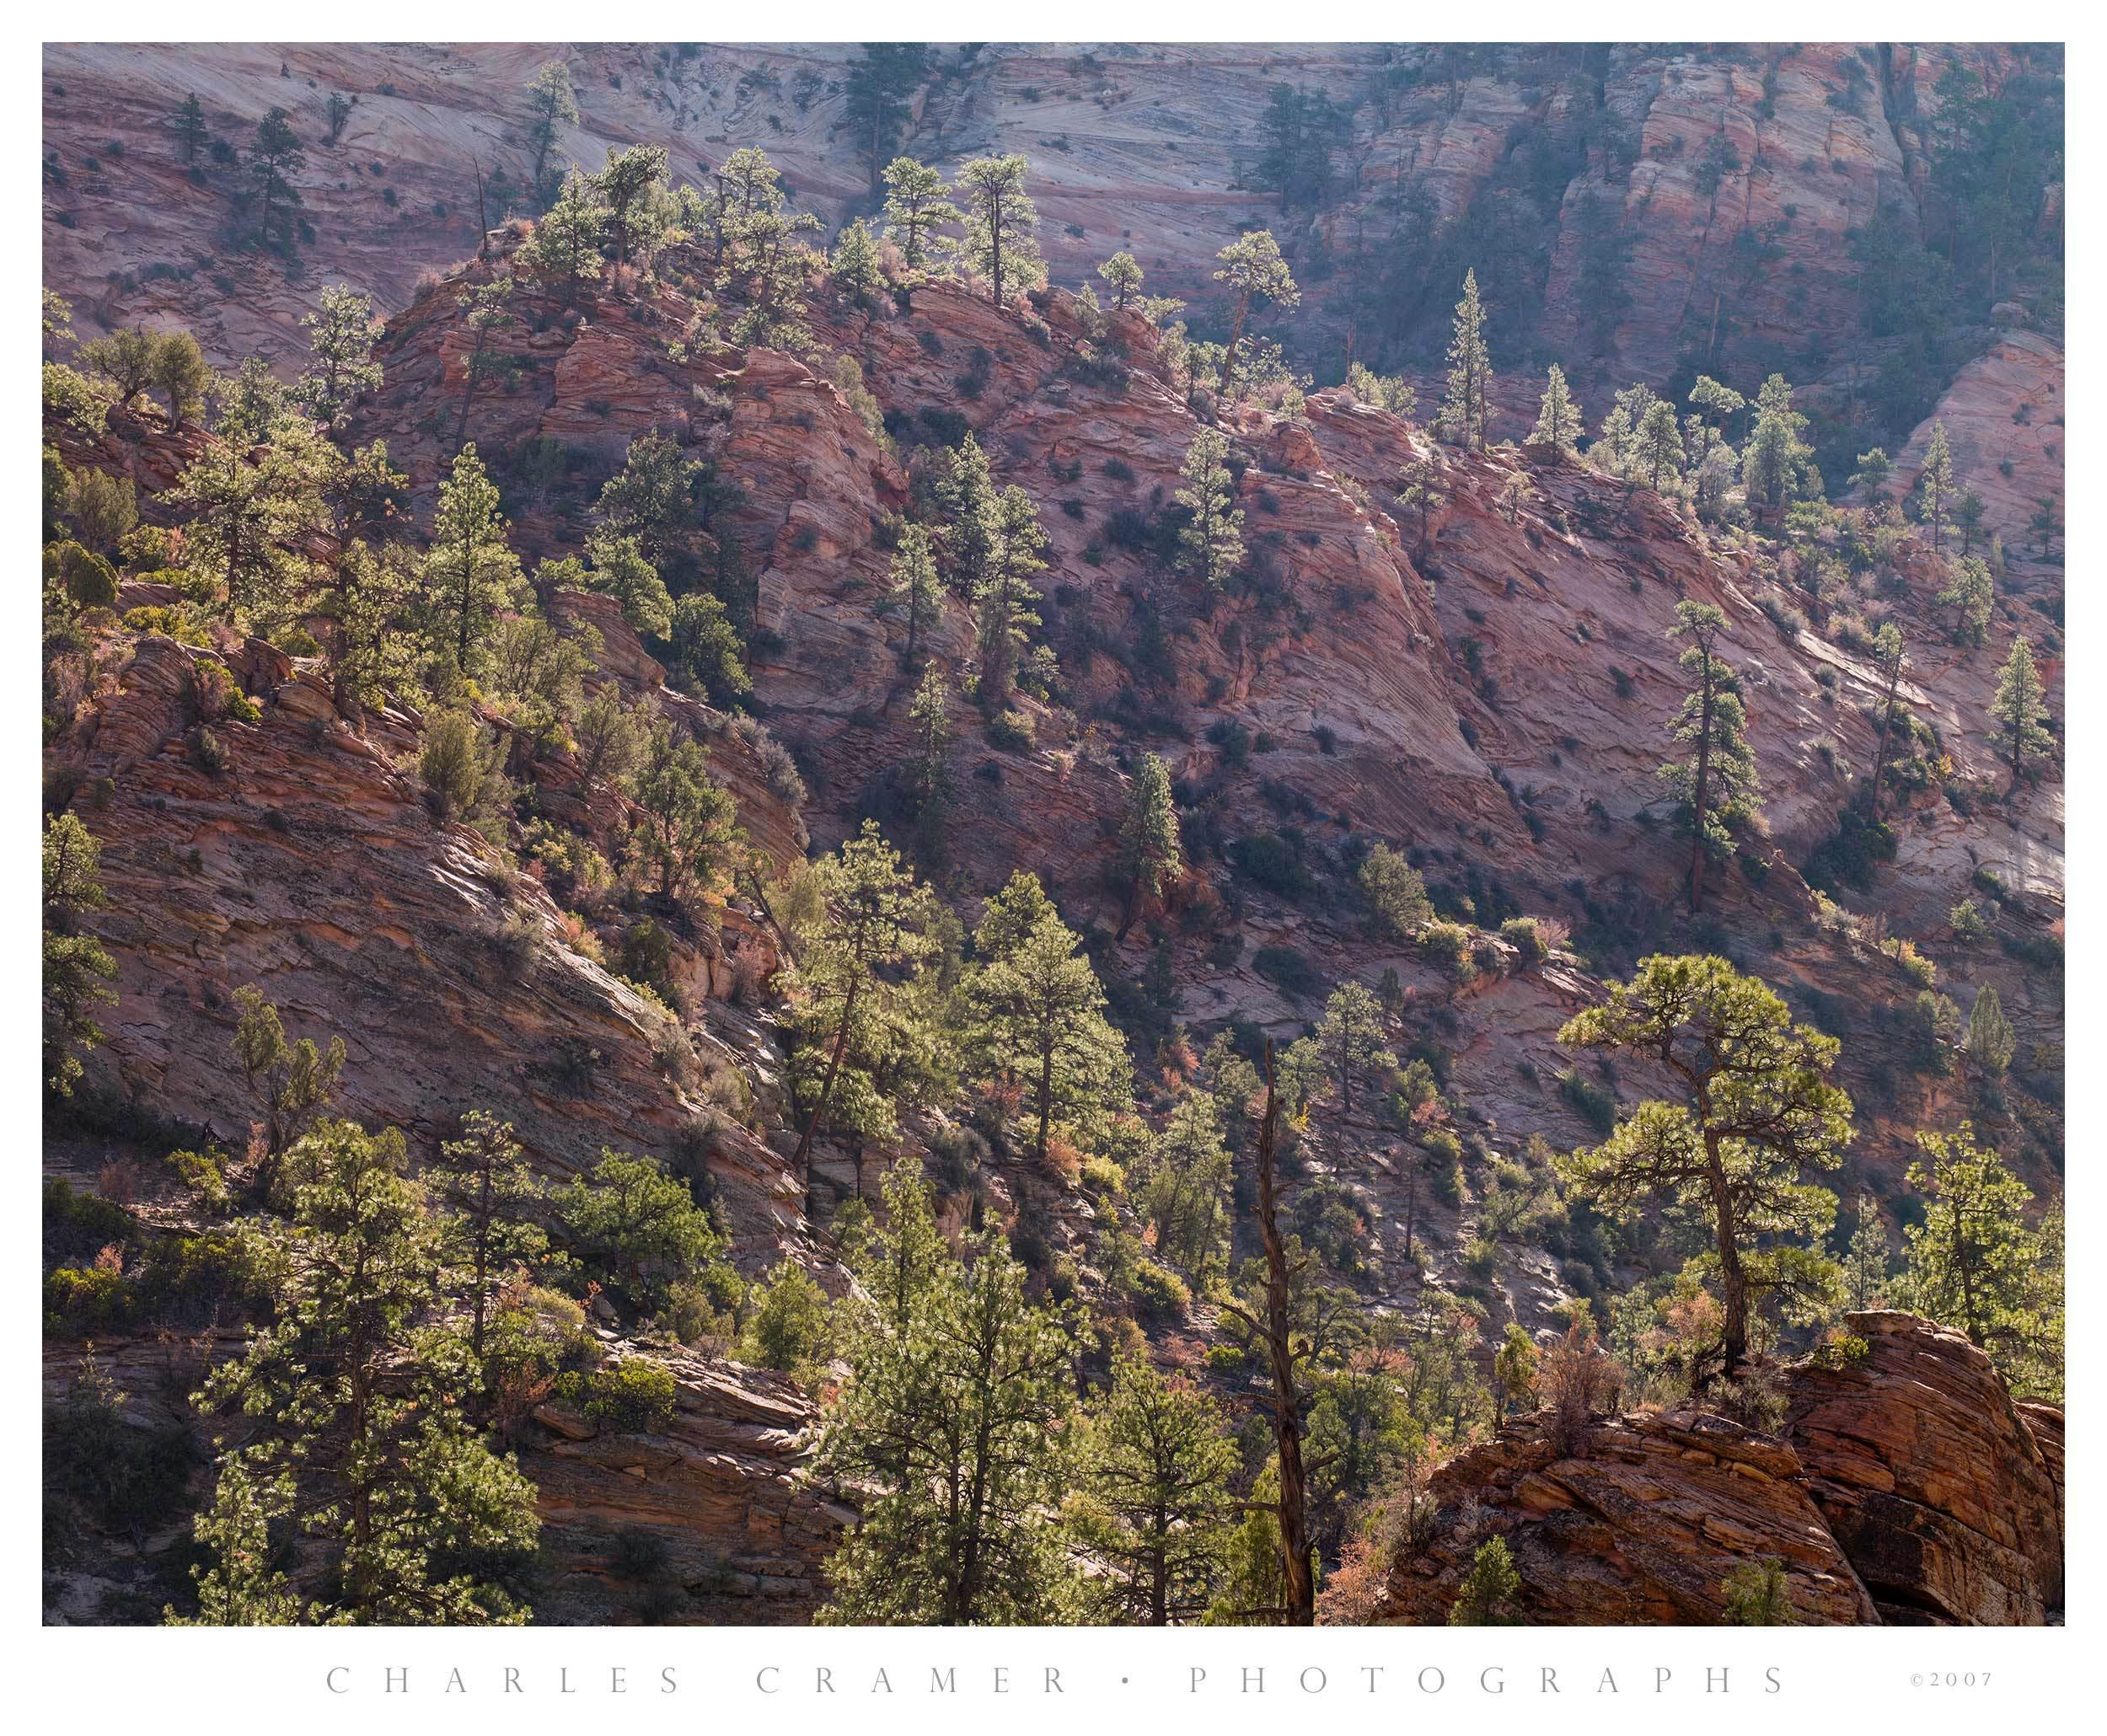 Backlit Pines, Sandstone Formations, Zion